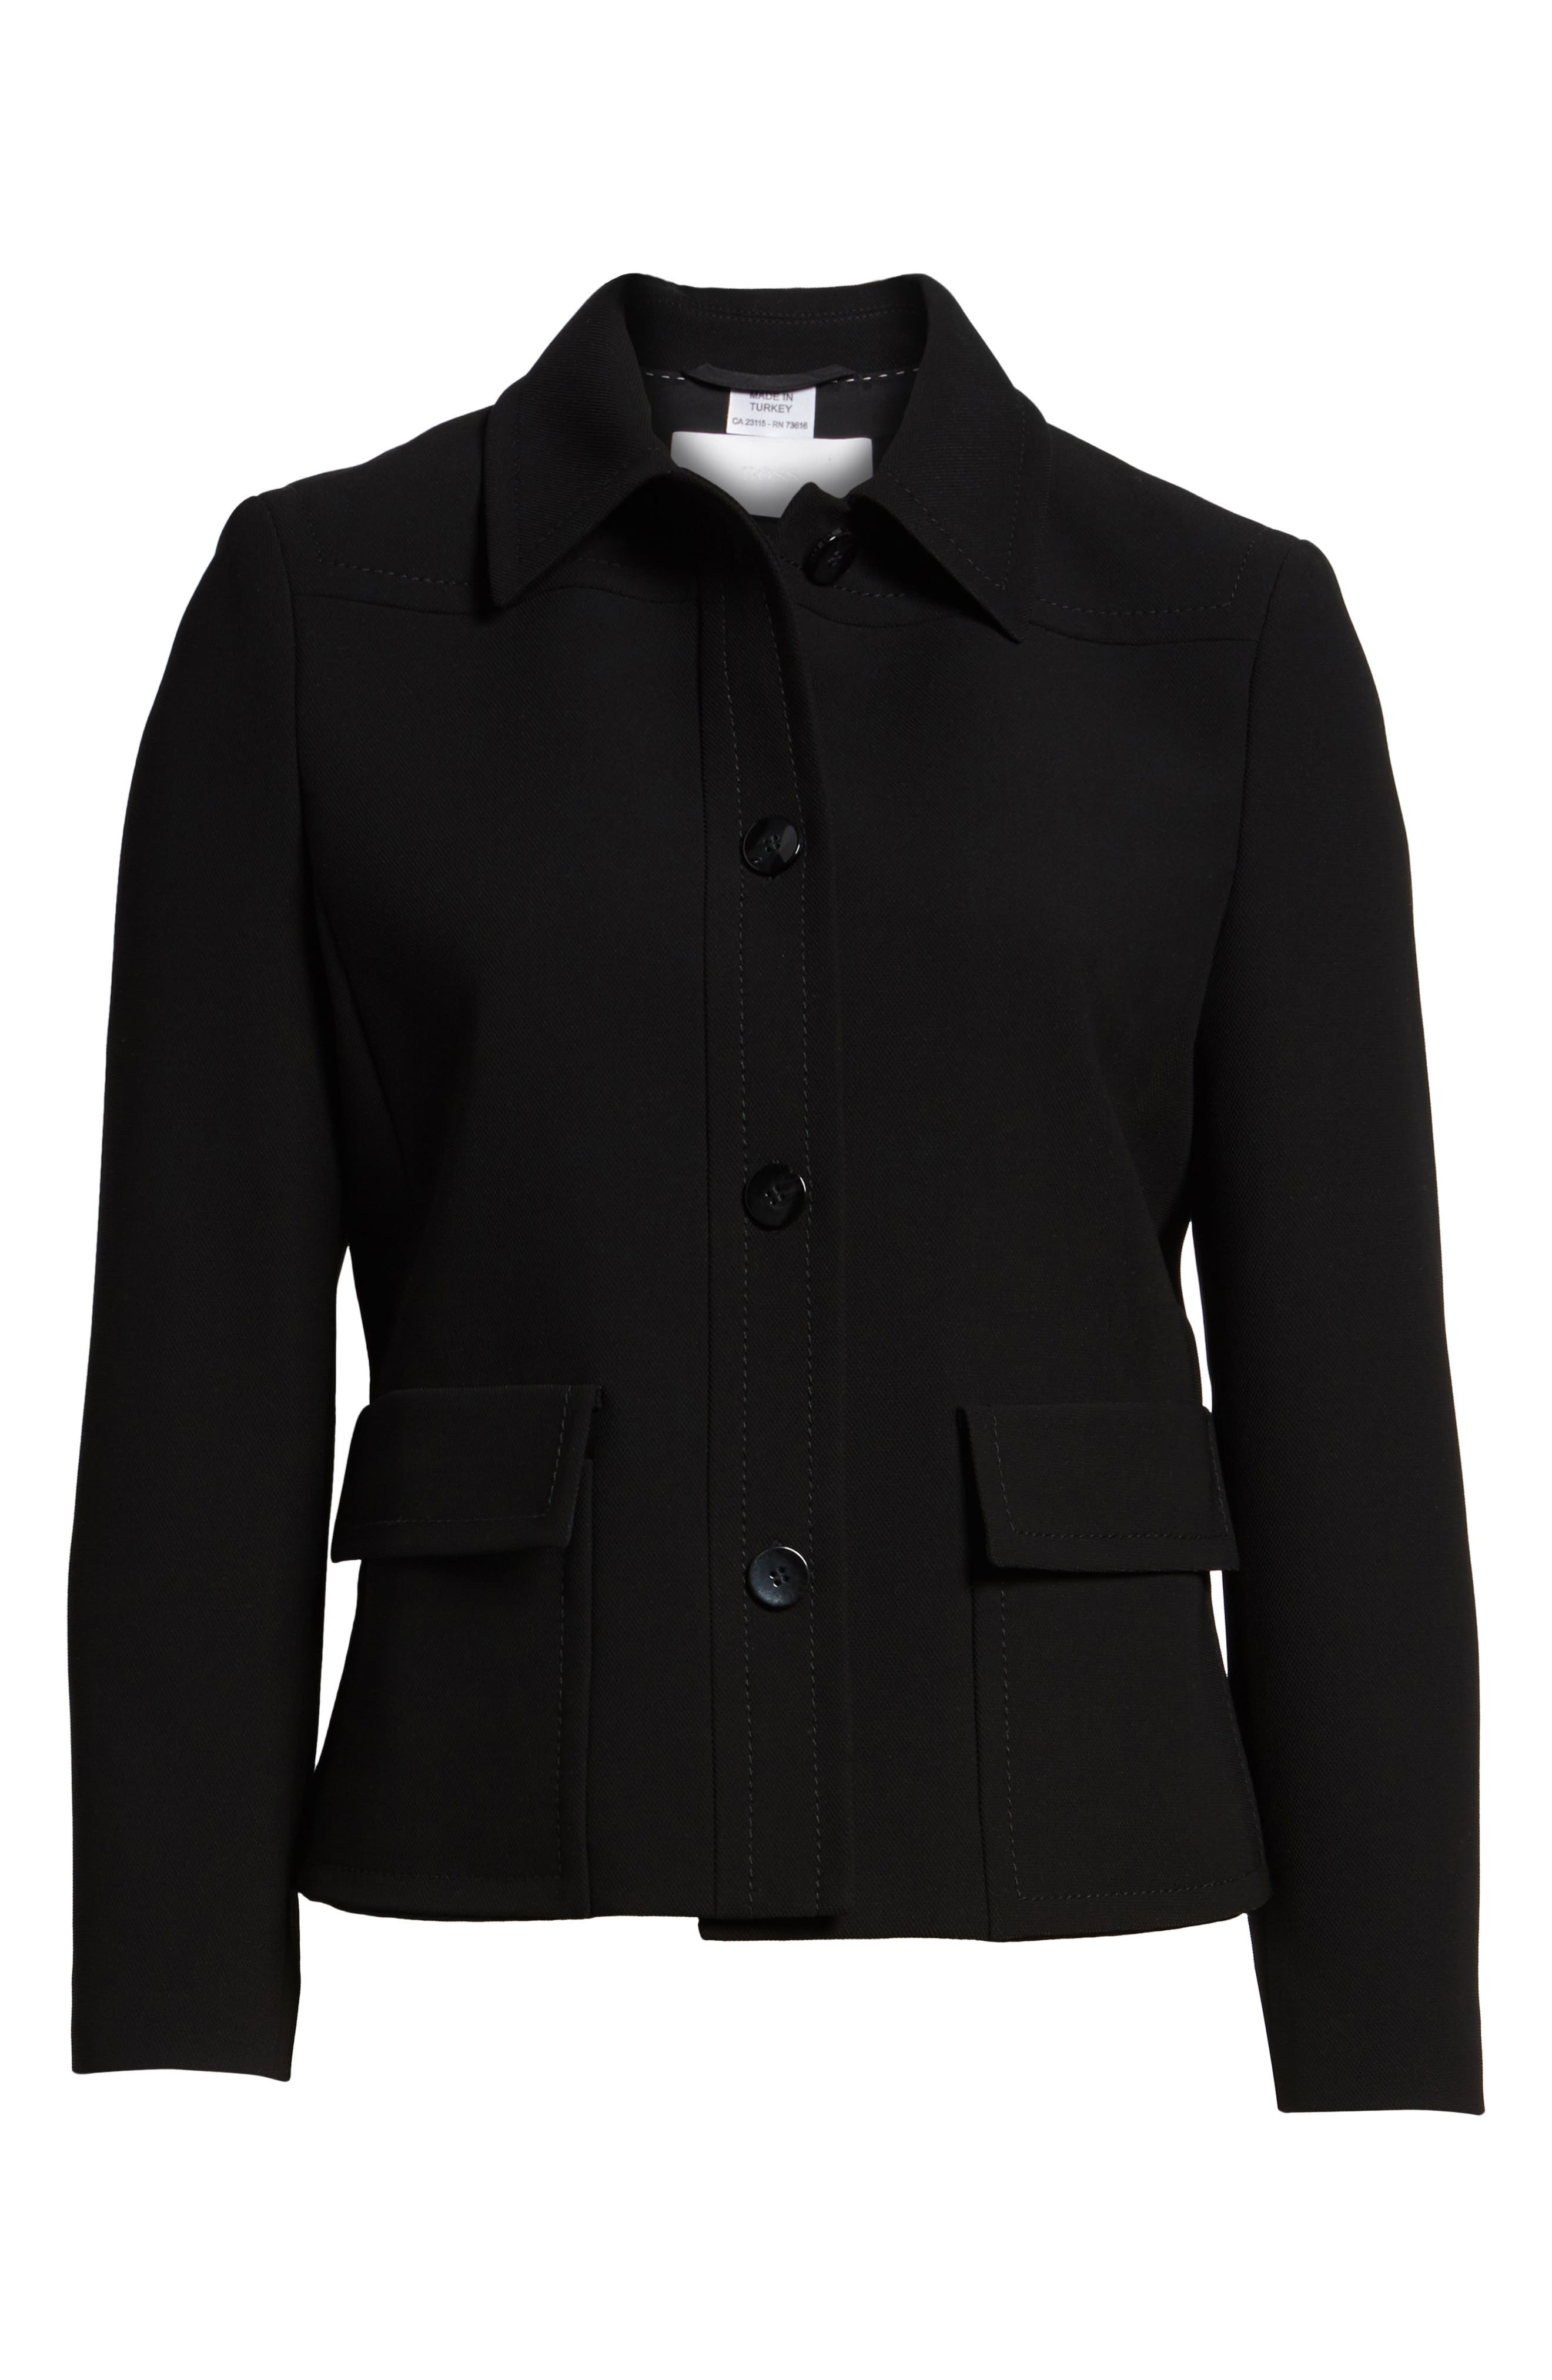 Juriona Crop Jacket,                             Alternate thumbnail 6, color,                             Black